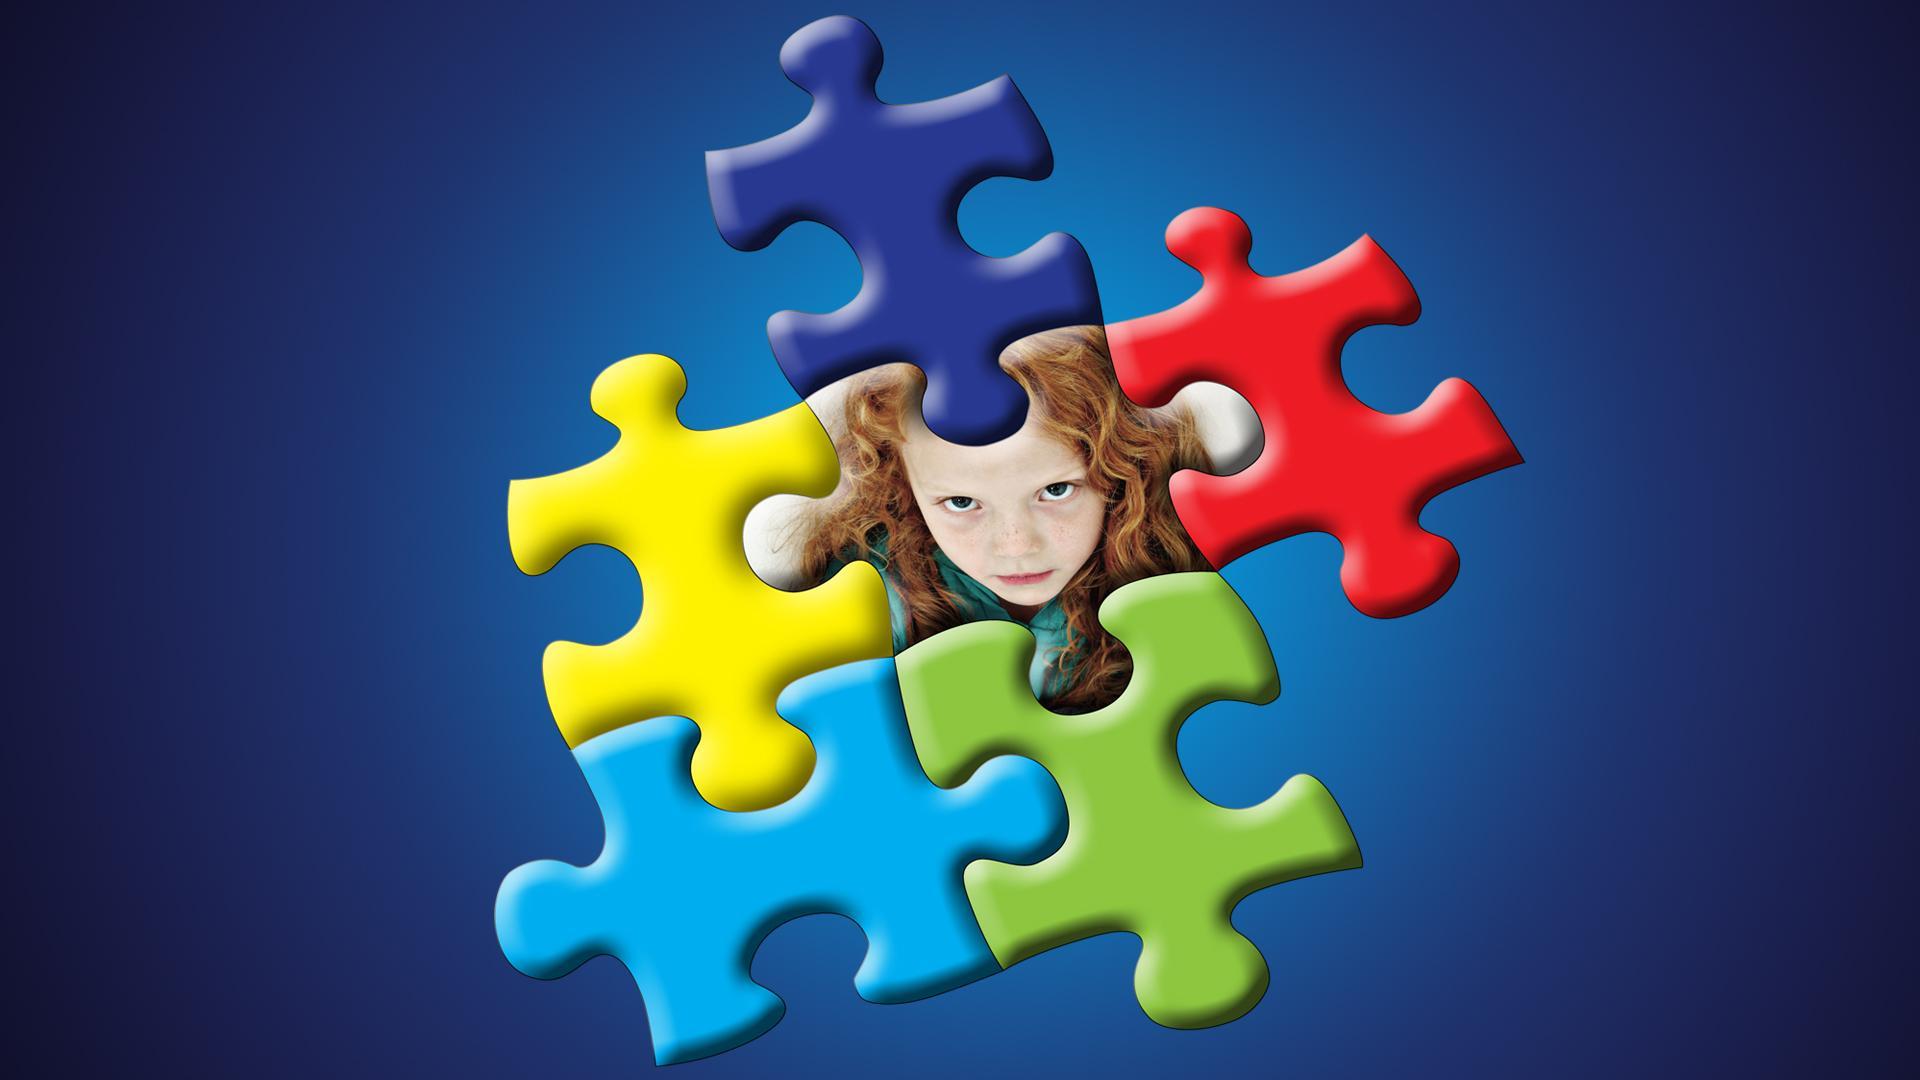 10 фактов об аутизме